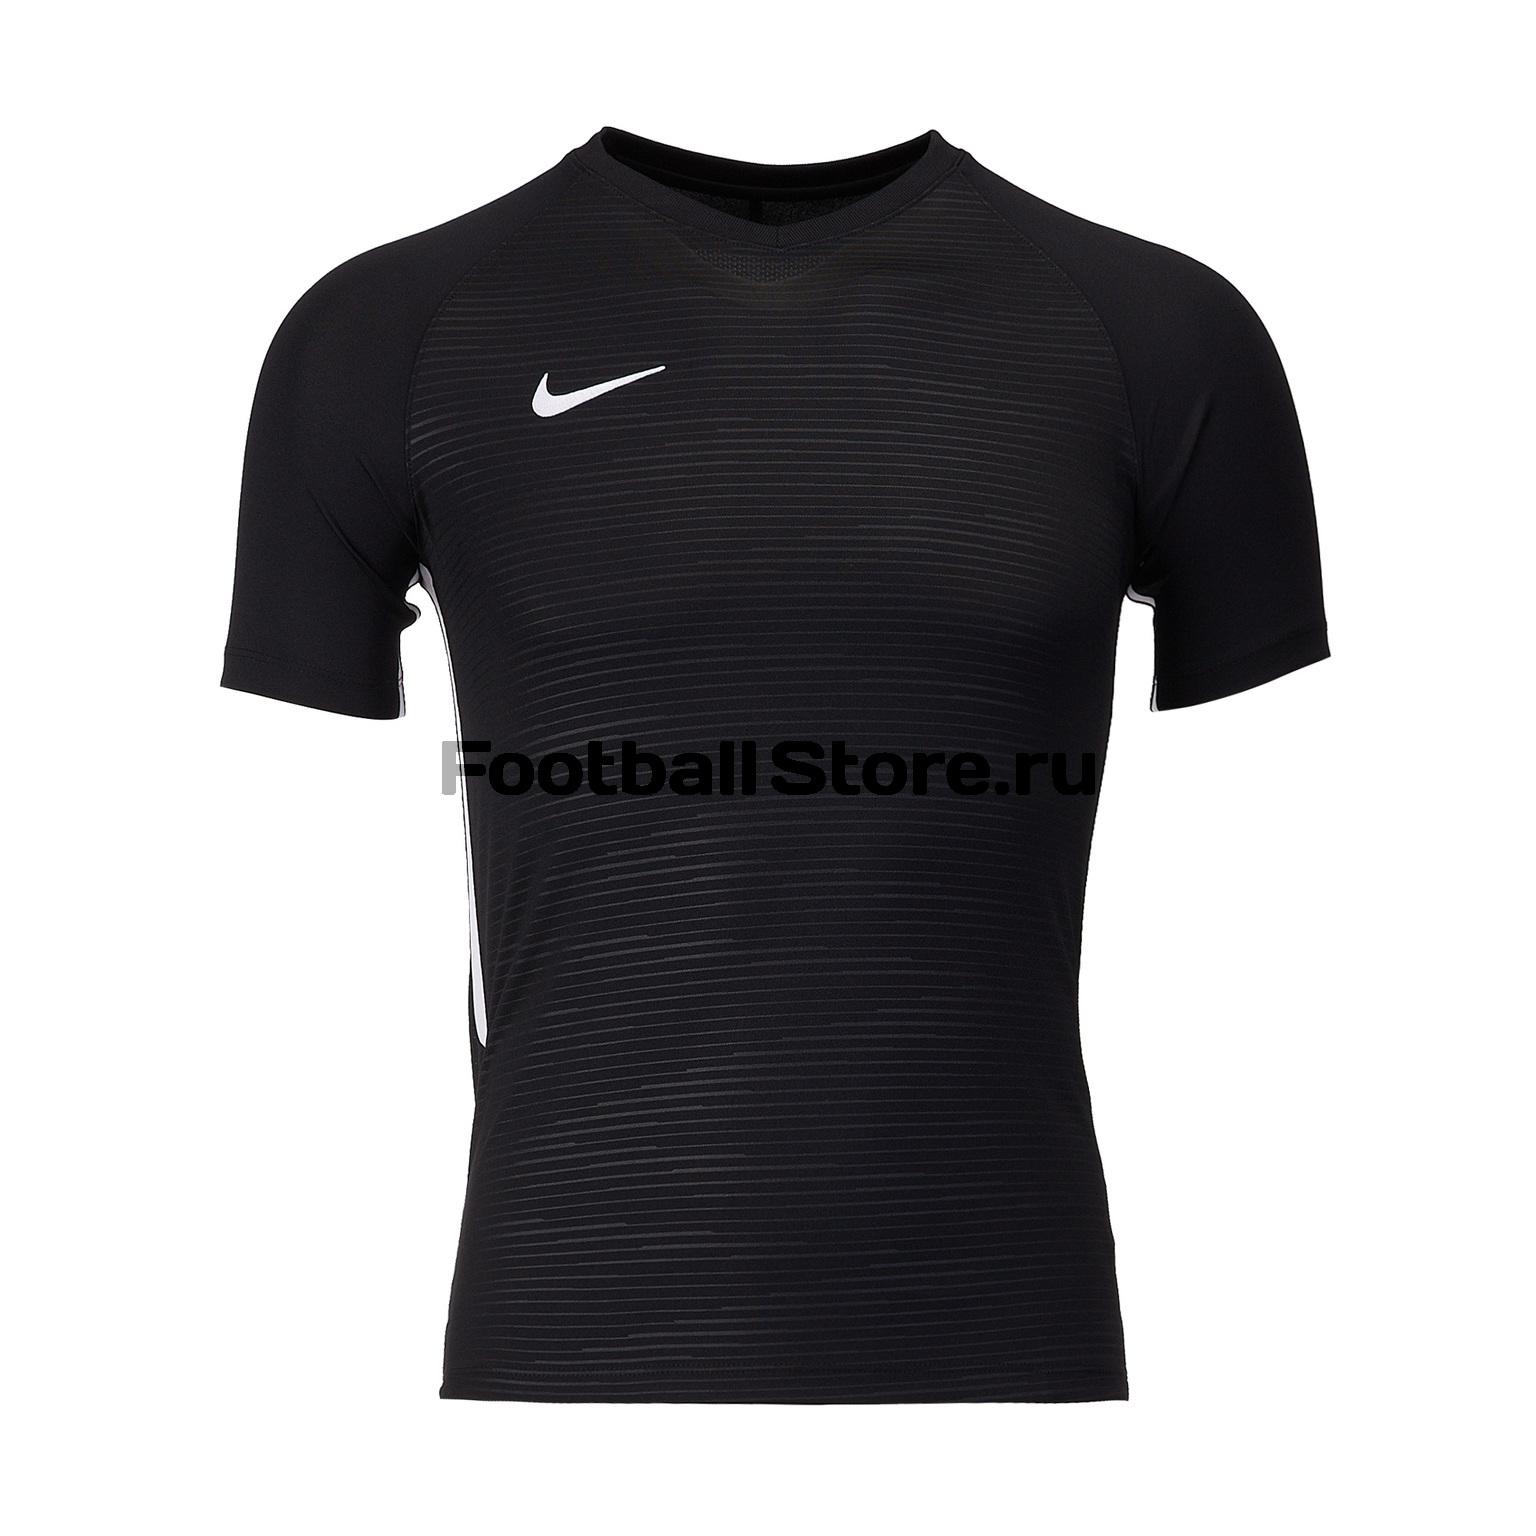 Футболка детская Nike Dry Tiempo Premier 894111-010 футзалки nike tiempo premier ii sala av3153 010